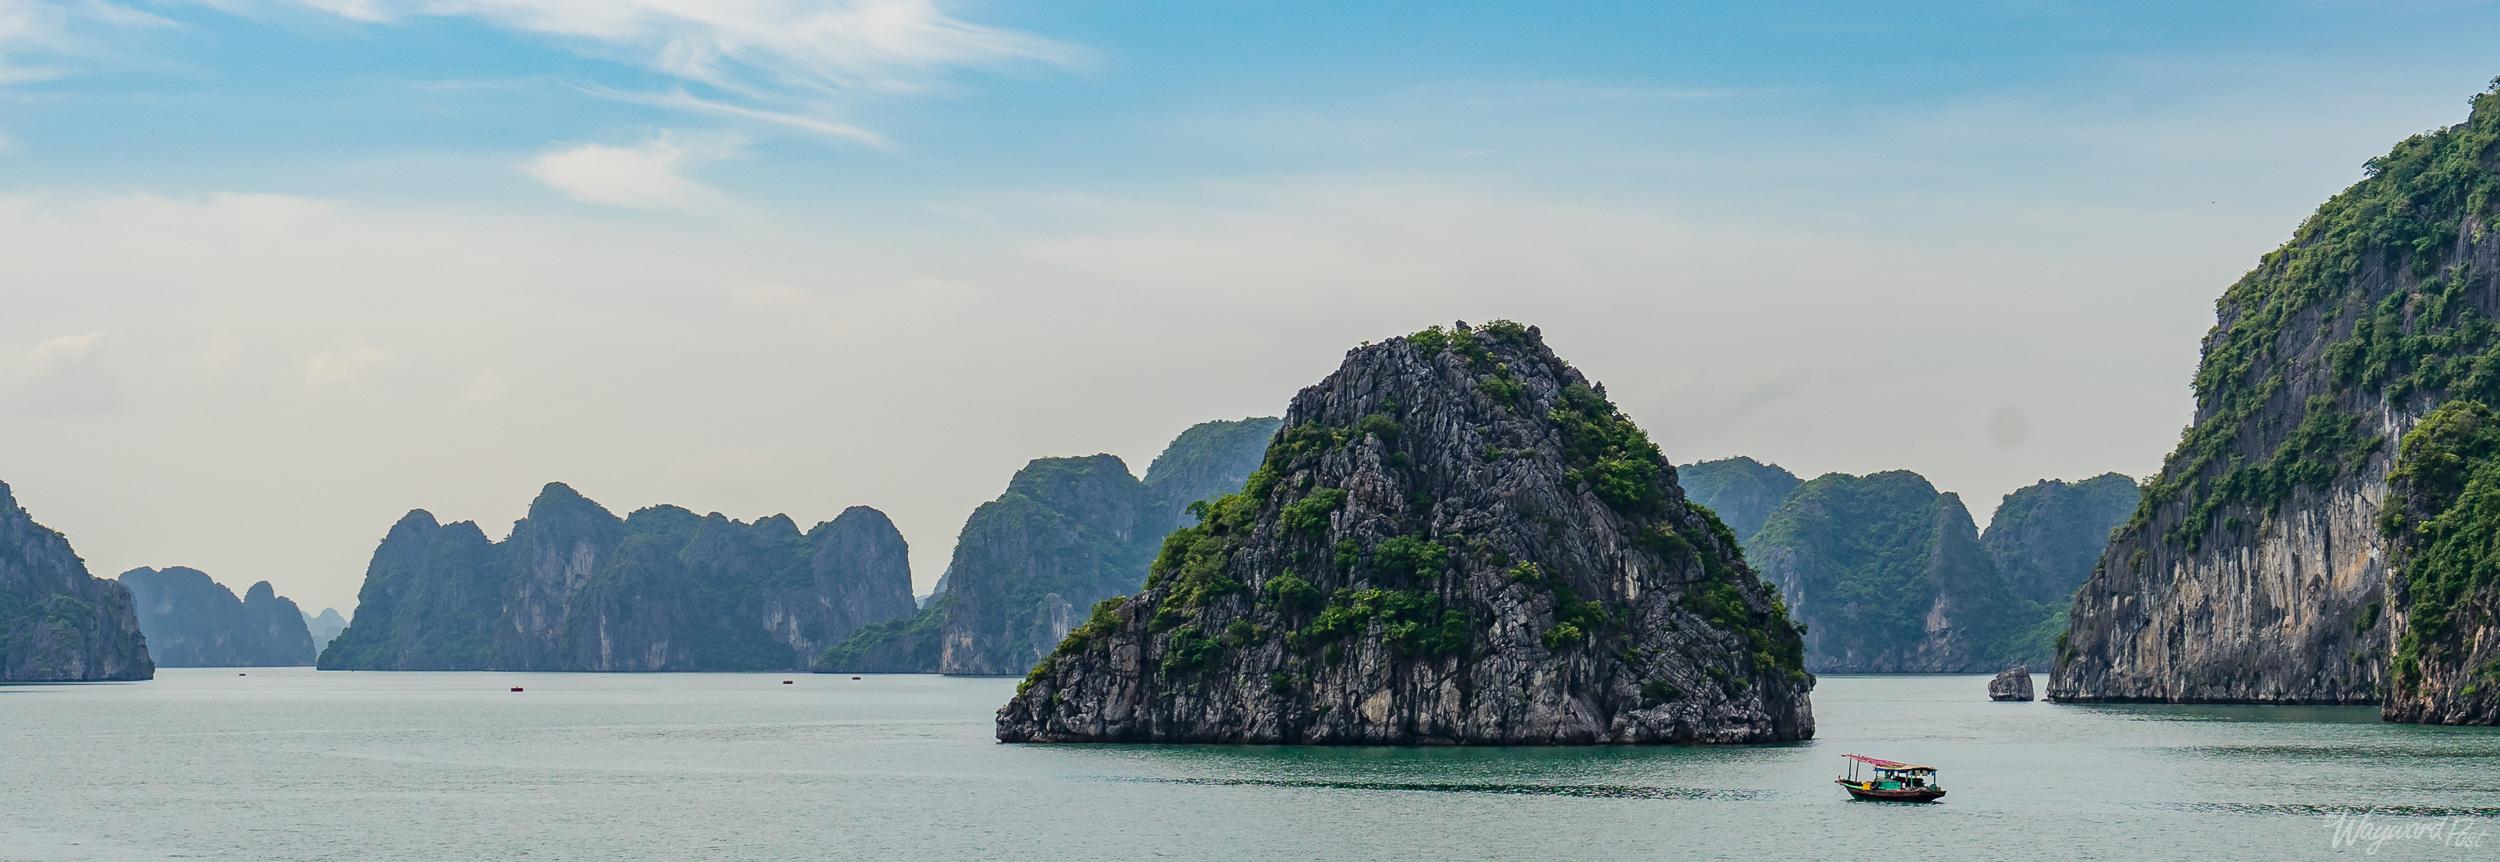 The Wayward Post - Photo Story - Ha Long Bay UNESCO-1.jpg